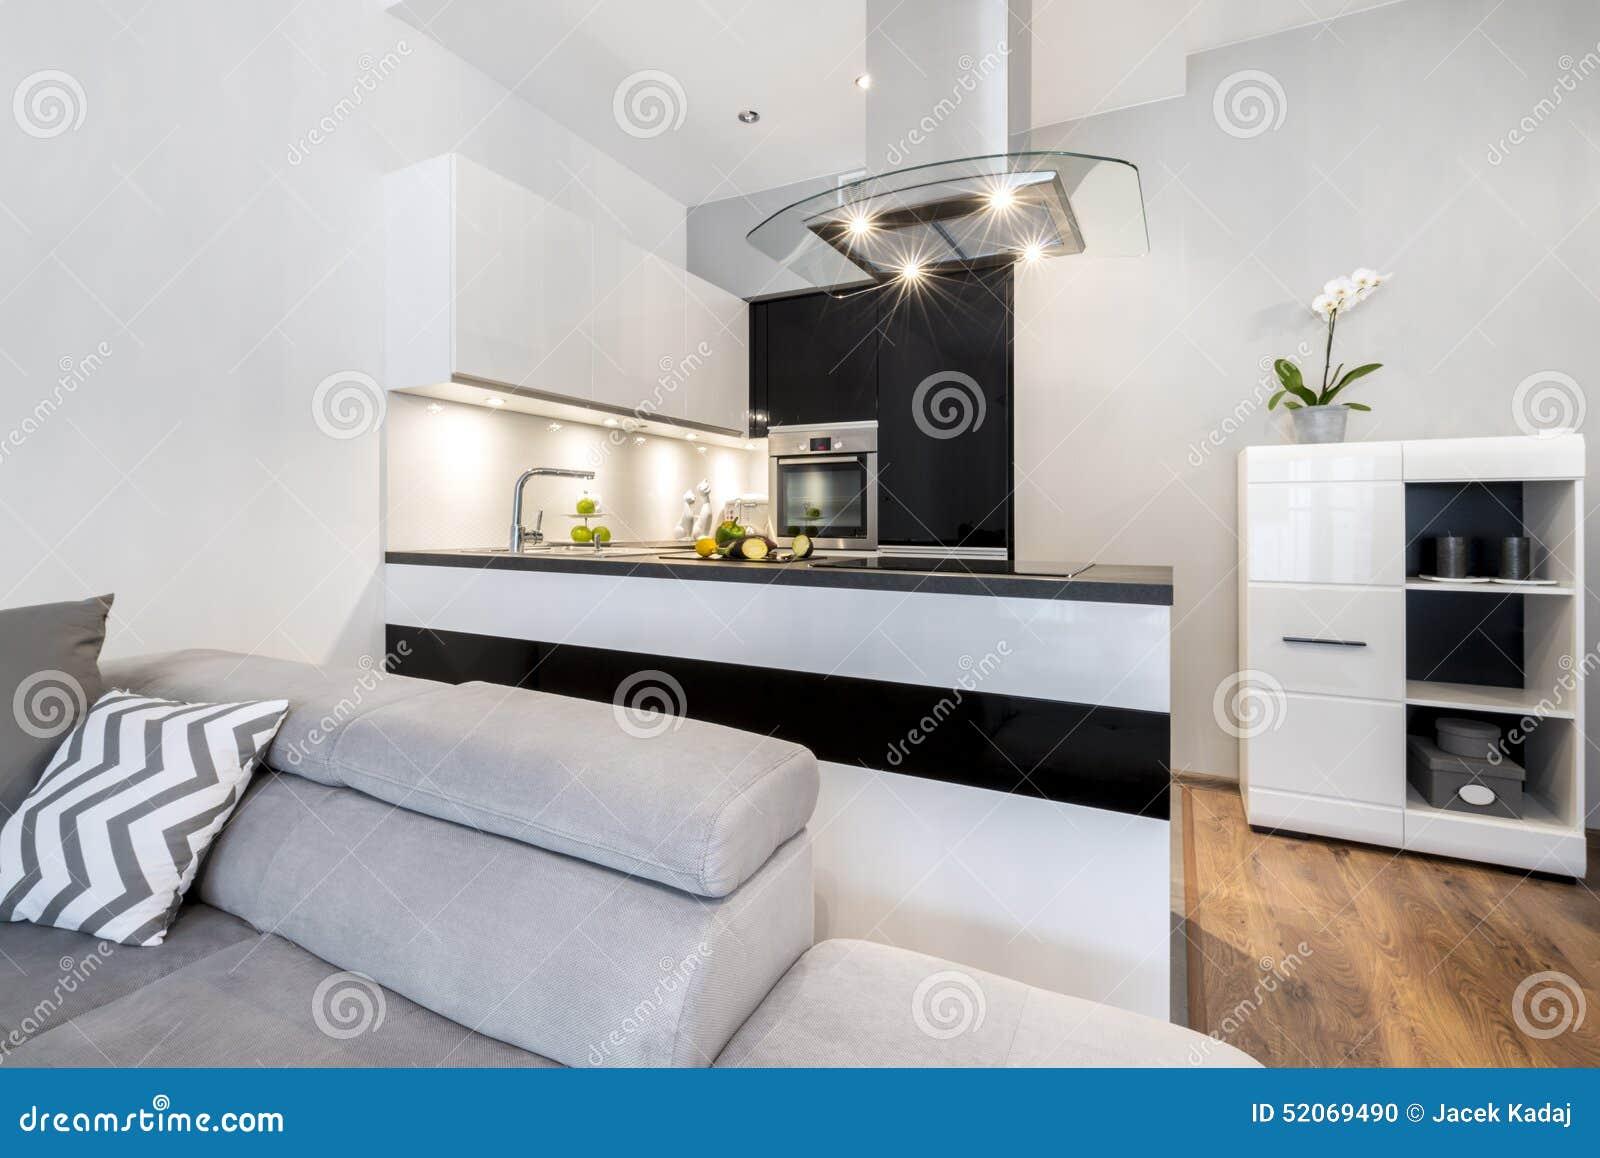 Keuken Moderne Klein : Moderne zwart witte kleine keuken stock foto afbeelding